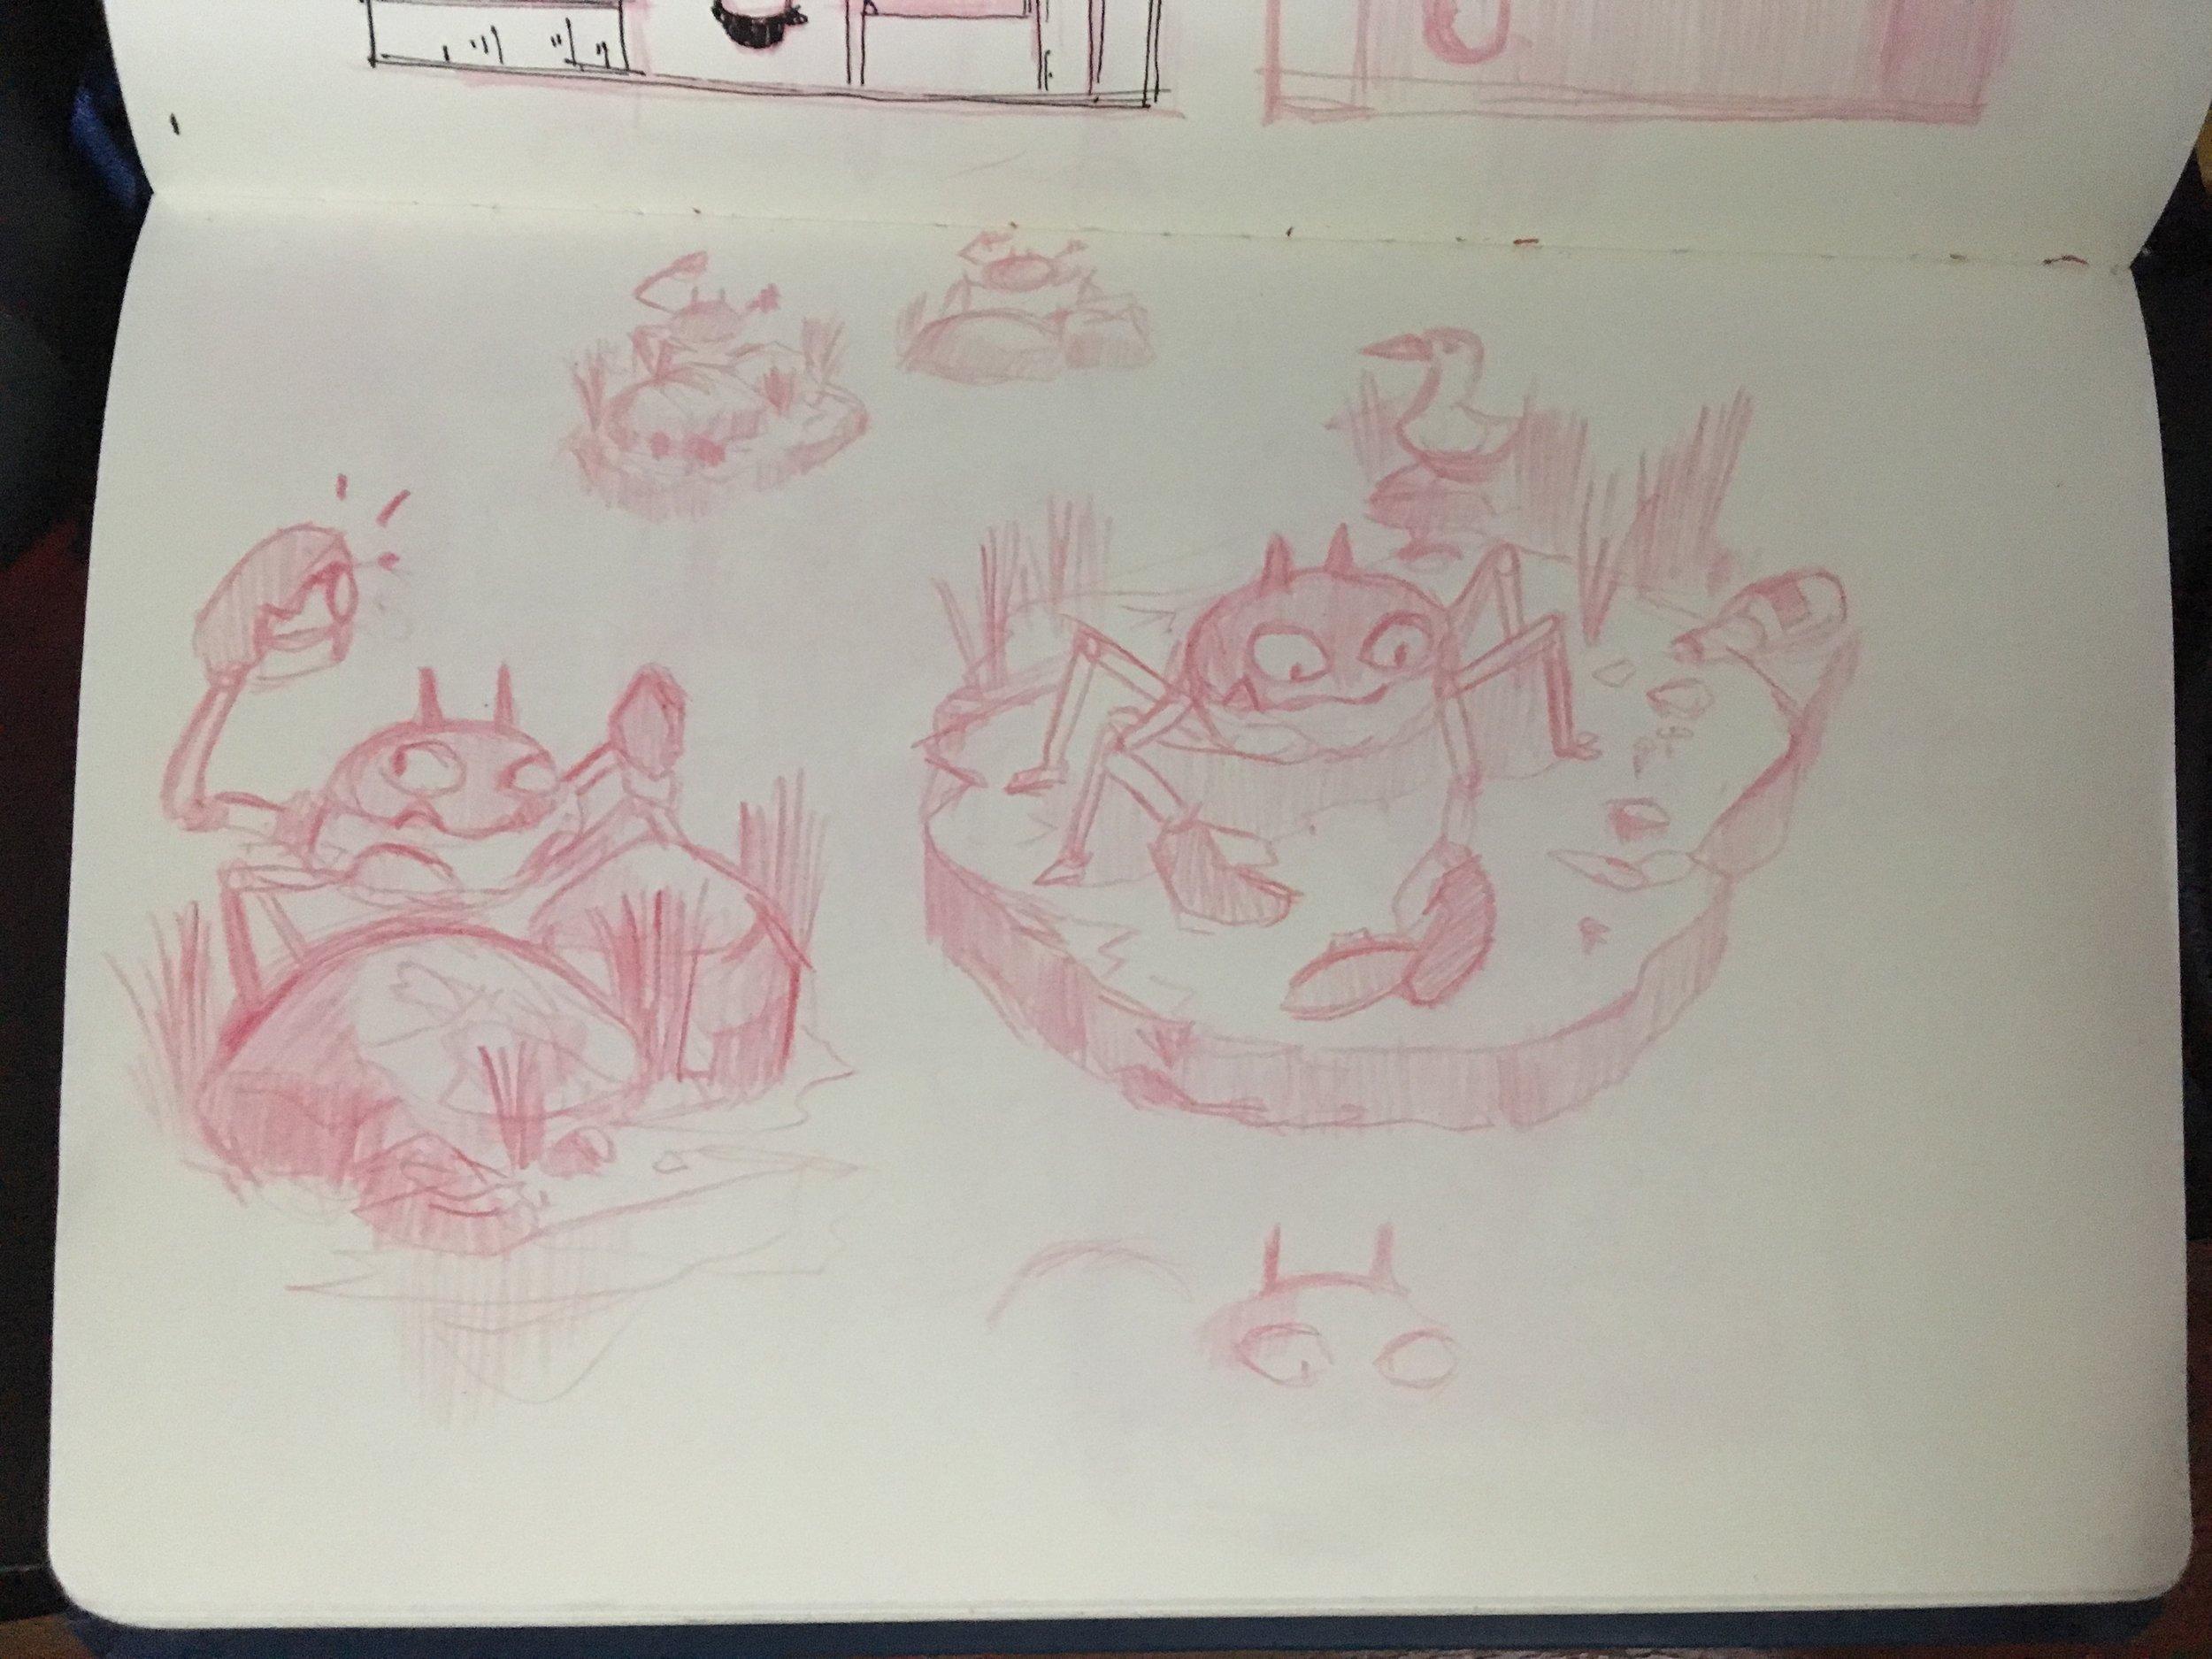 krabby sketch.JPG